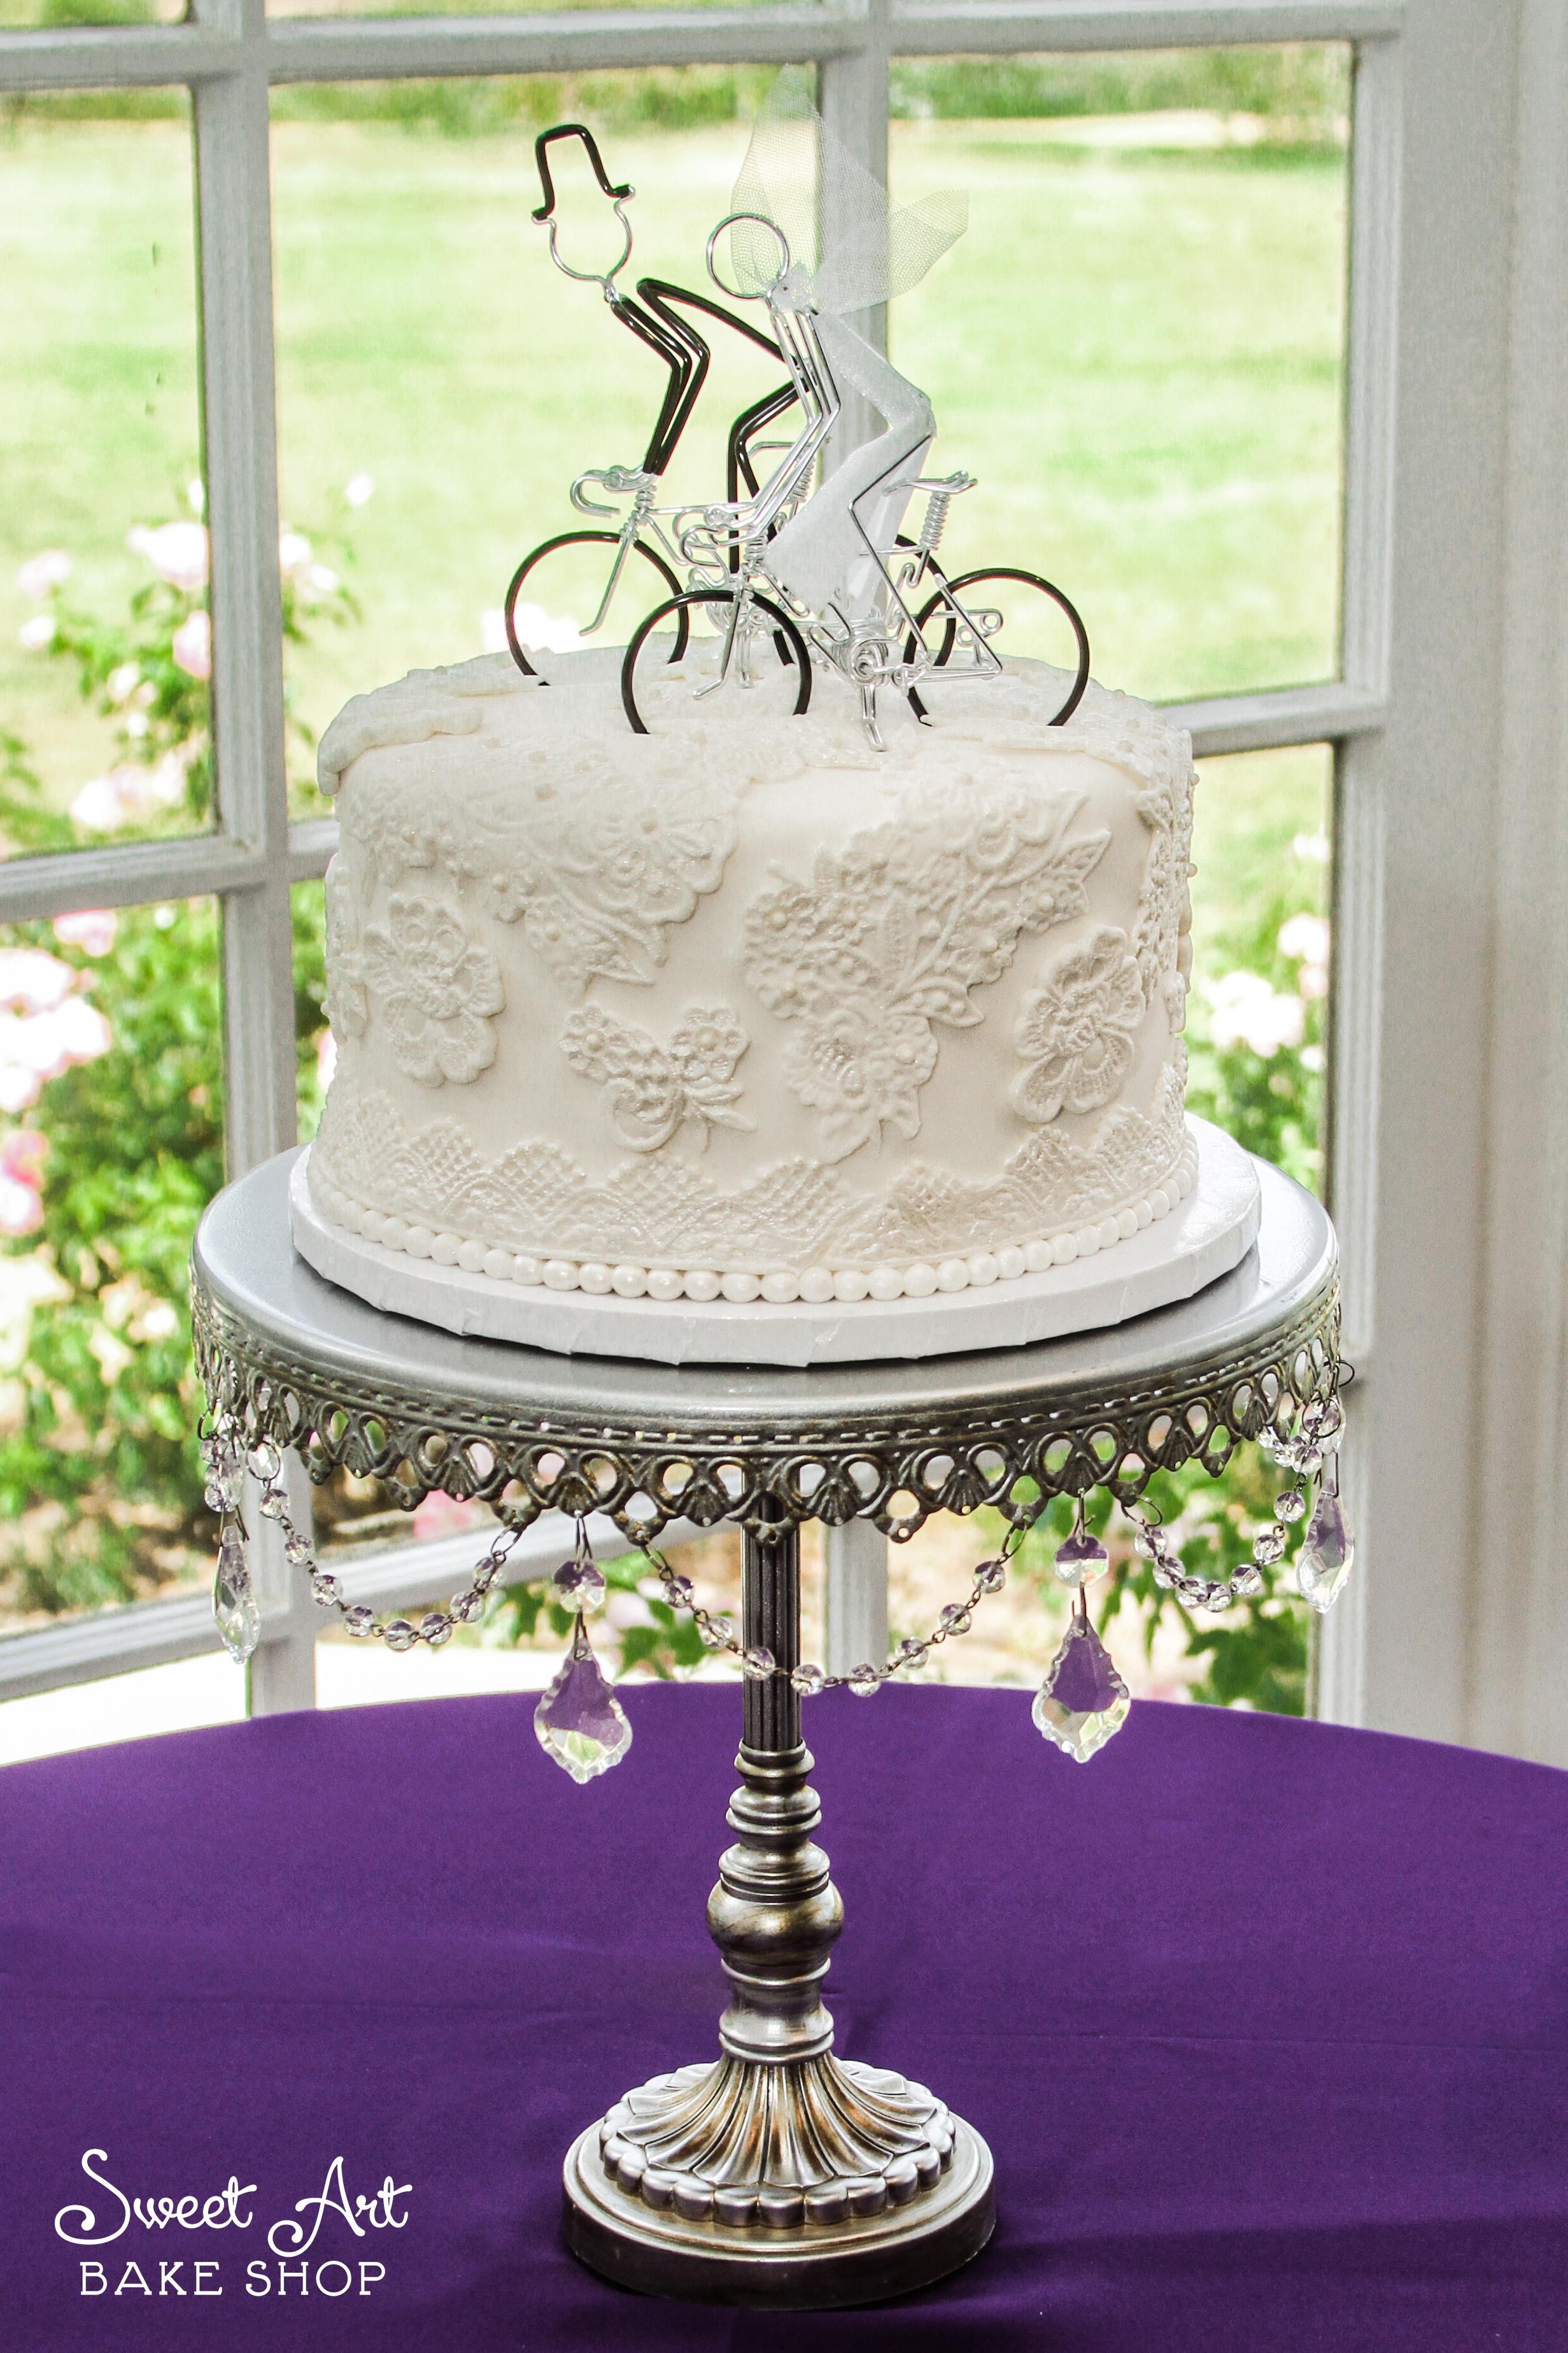 Lace Cutting Cake